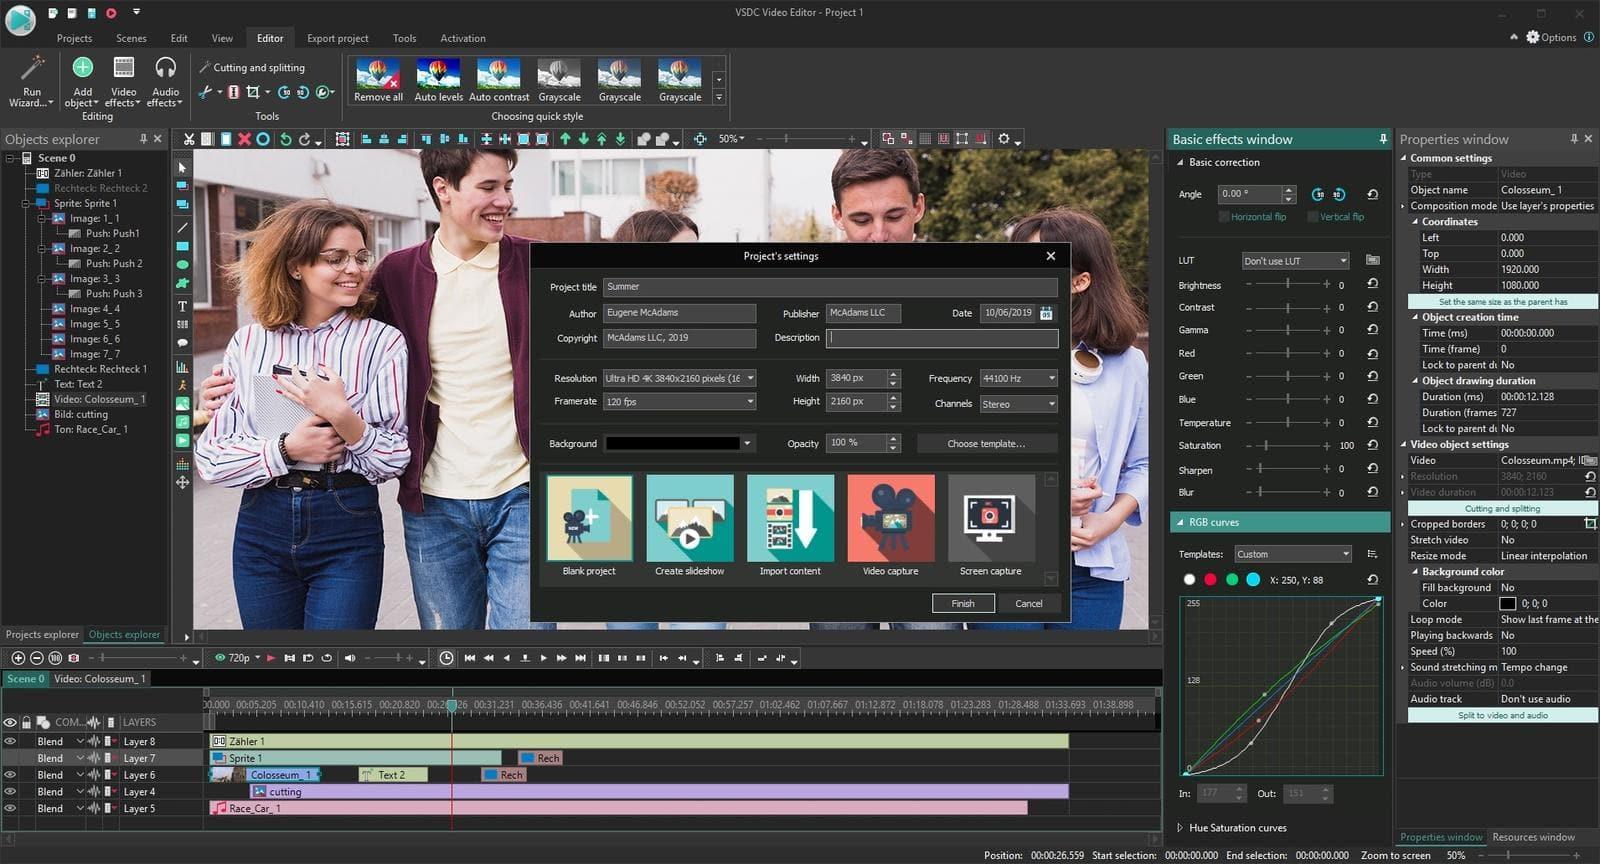 VSDC-Video-Editor-Pro-Coupon-Code-&-Promo-Codes